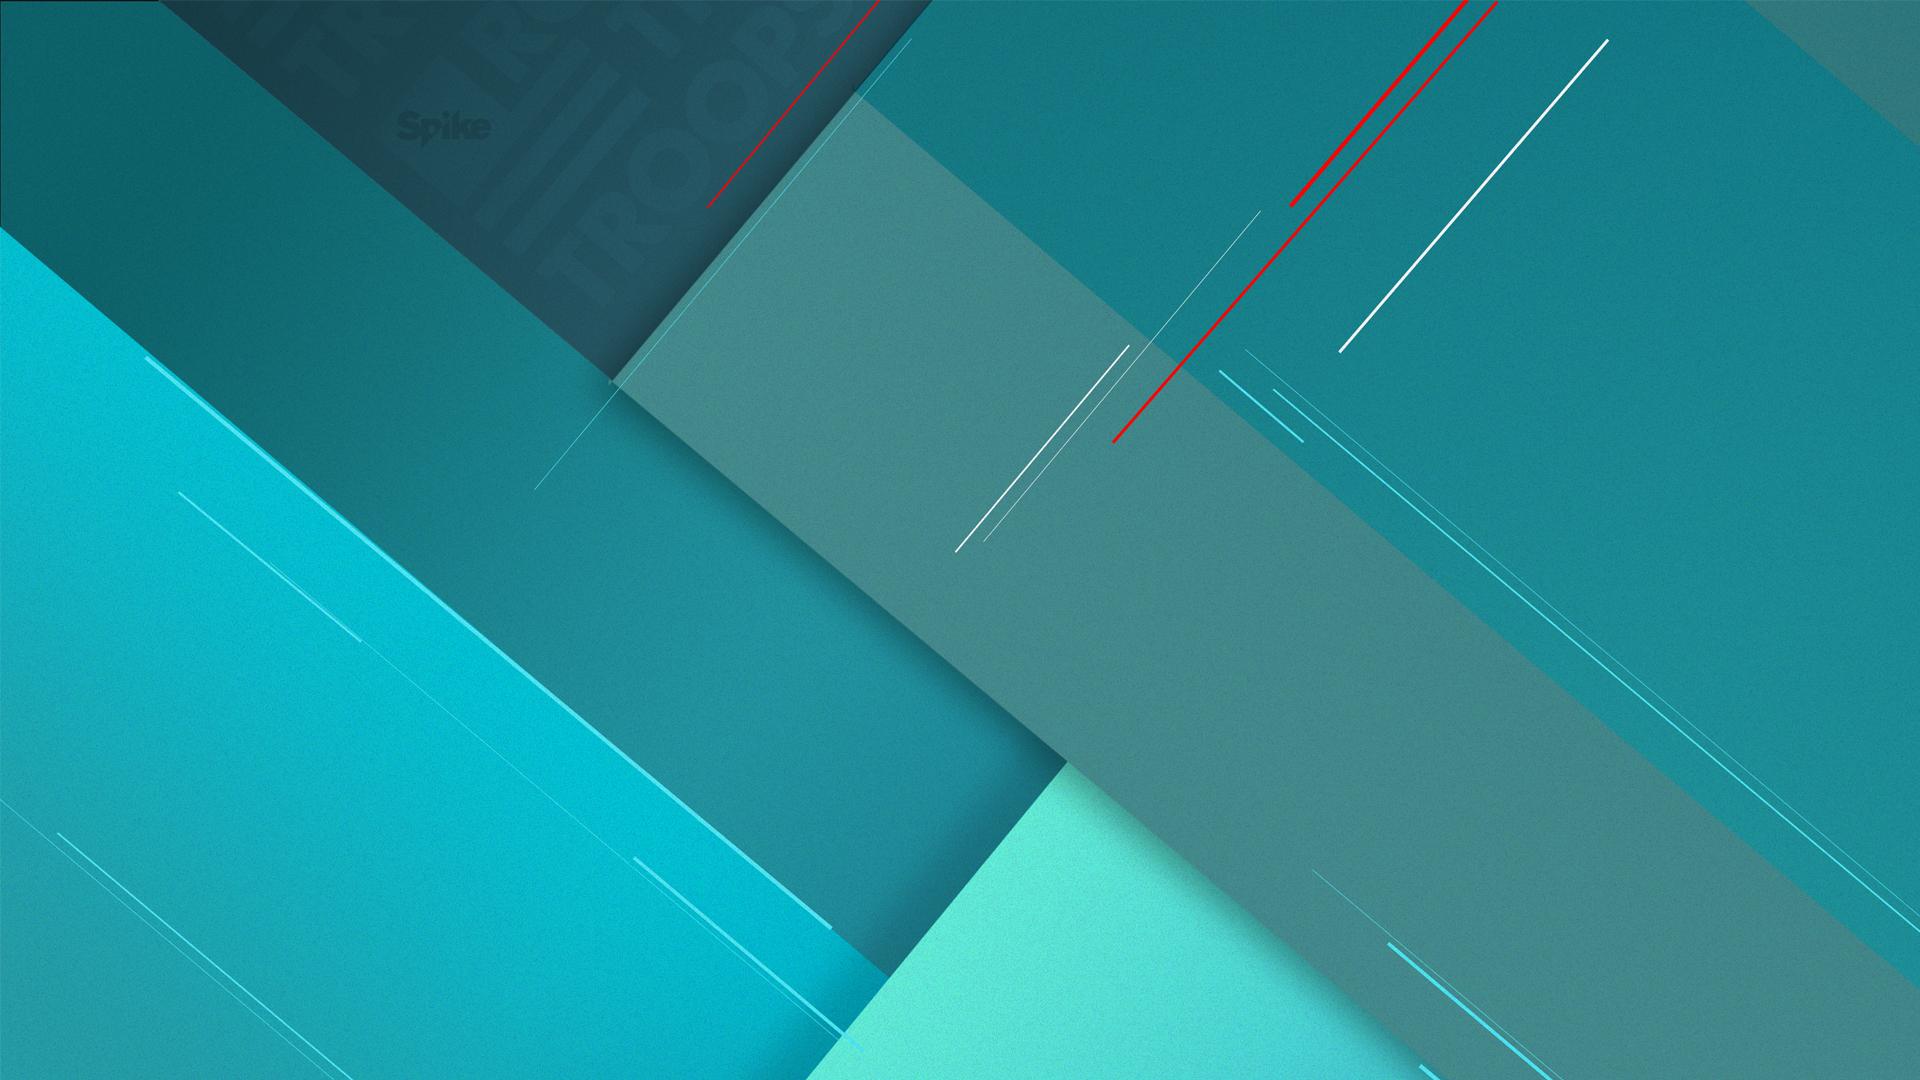 06 RTT_Wallpaper_16_0925_MVW_02.jpg